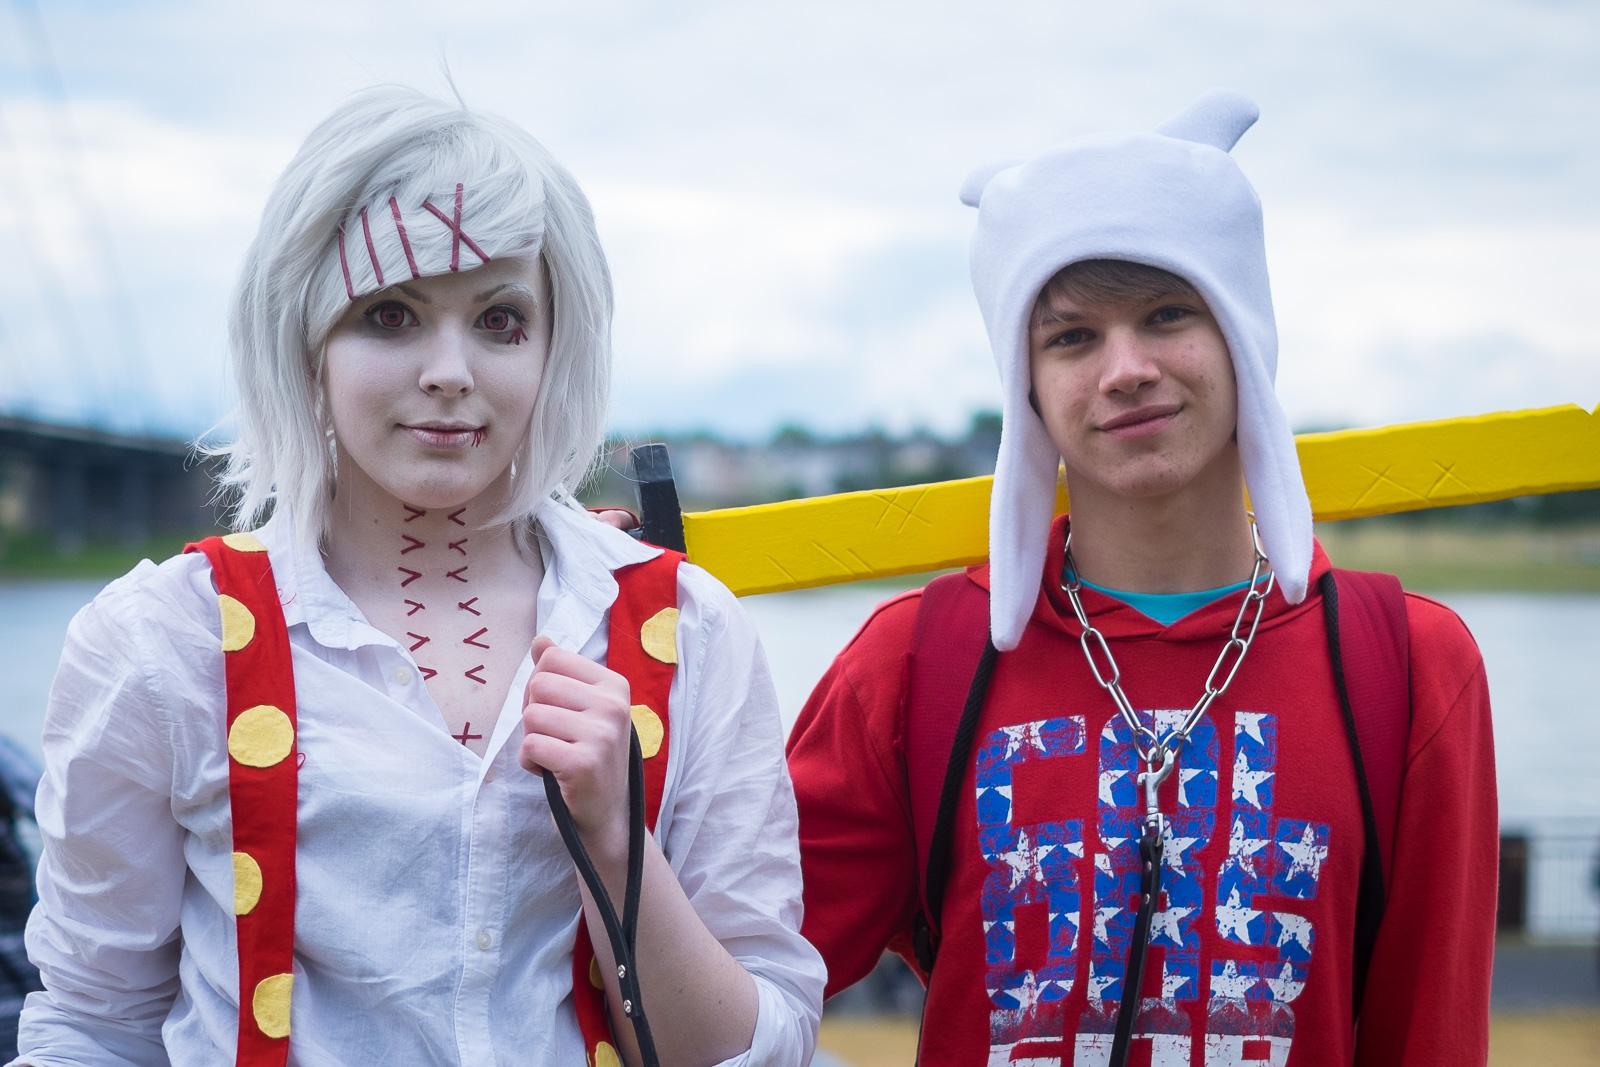 stb_cosplay-3.jpg